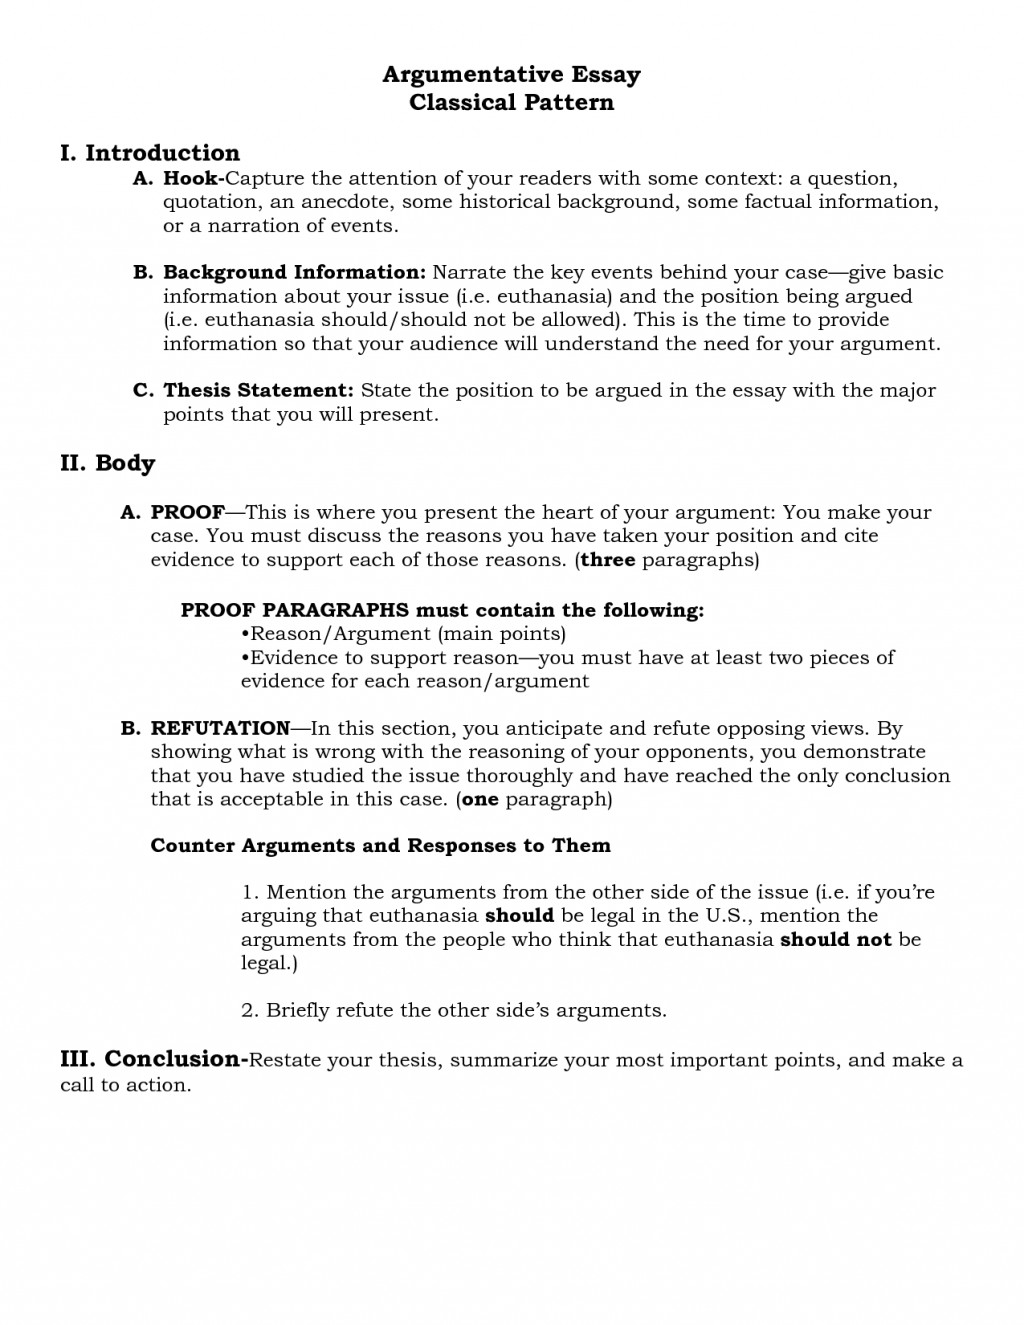 006 Essay Example Argument Outline Remarkable Sample 5 Paragraph Argumentative Template Blank Large